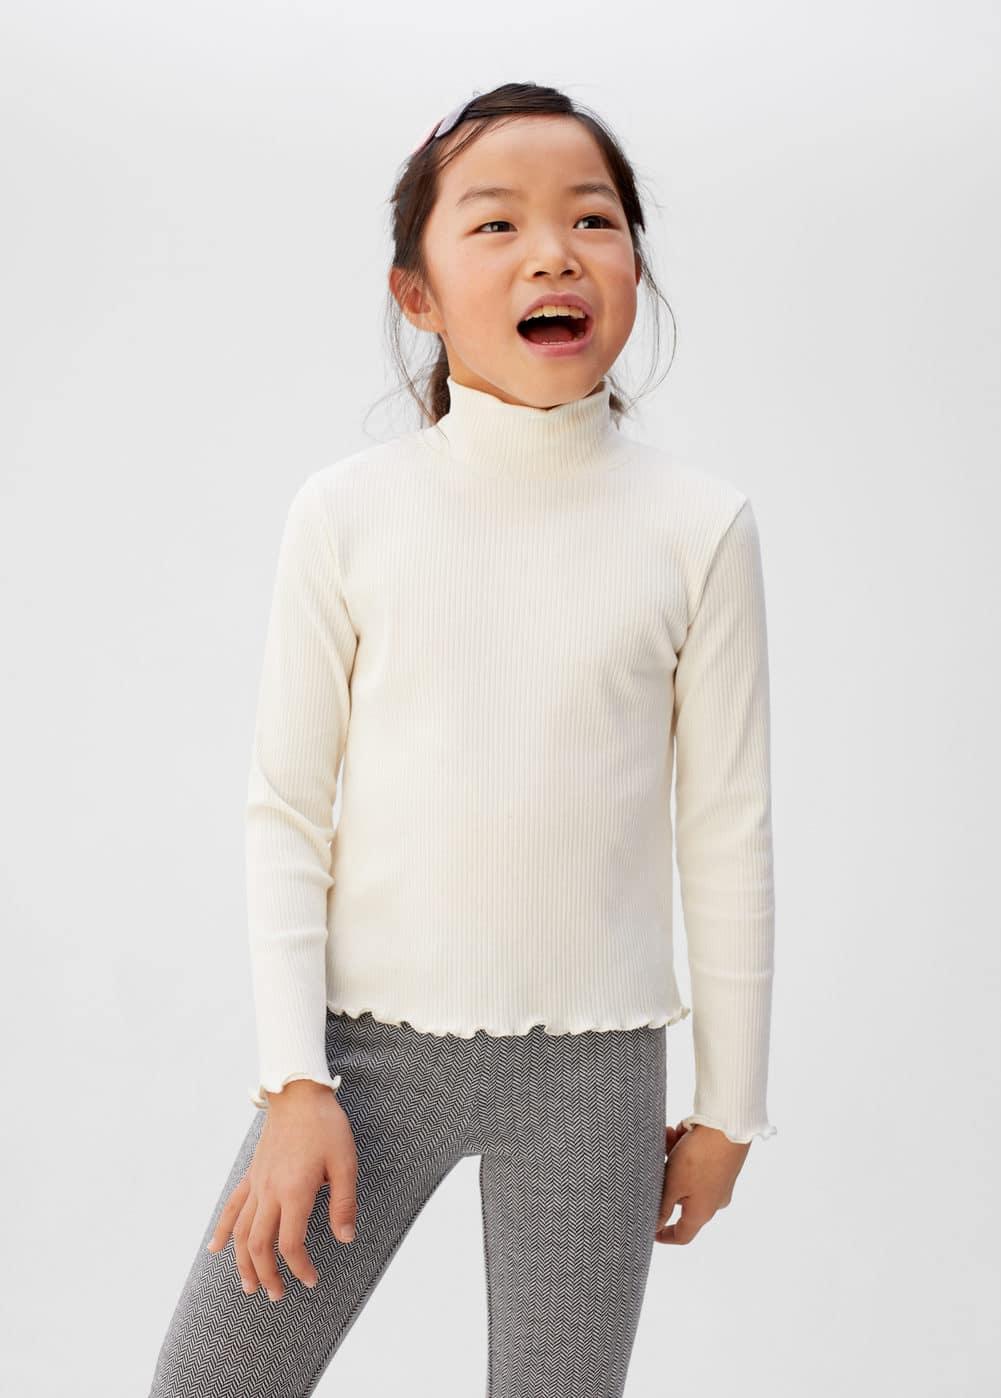 a-archi:leggings diseno combinado